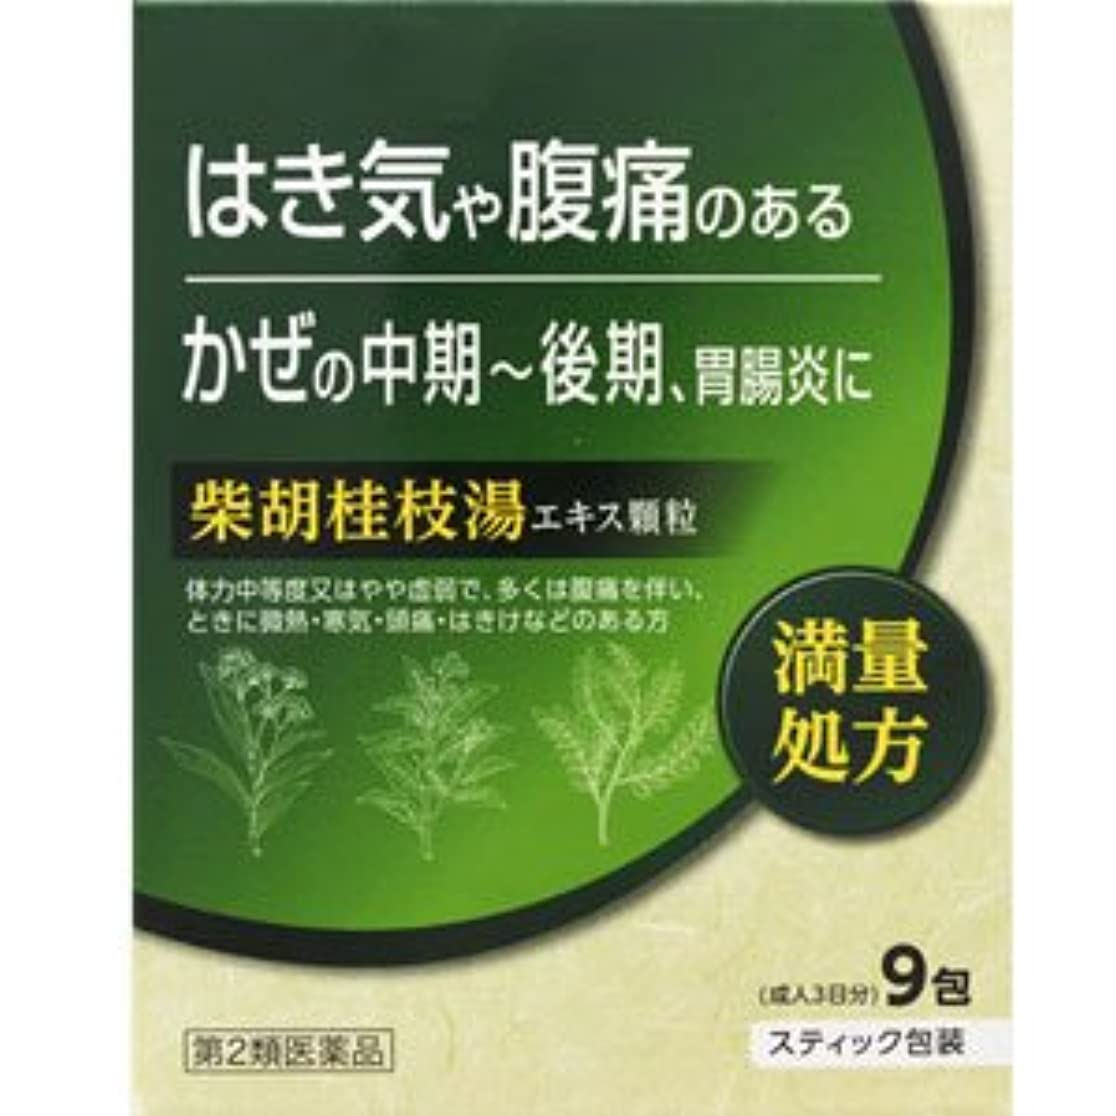 非難修理工劣る【第2類医薬品】柴胡桂枝湯エキス顆粒KM 9包